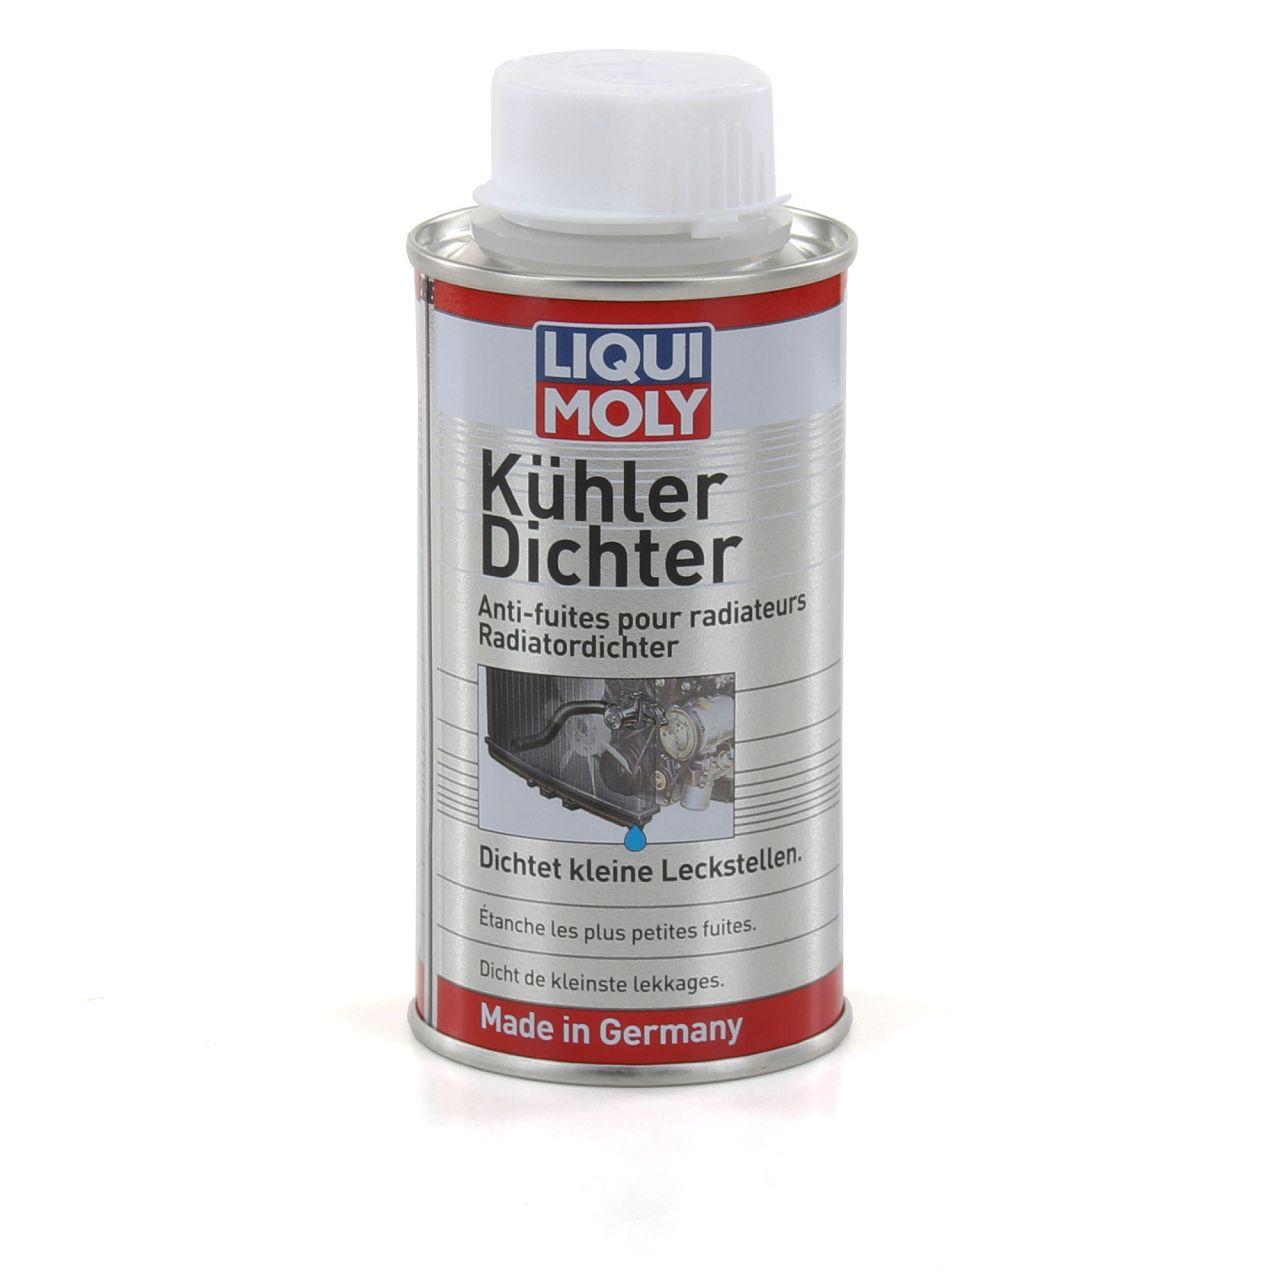 LIQUI MOLY Kühlerdichter Kühler-Dichtmittel-Additiv Dichtungsmittel 150 ml 3330